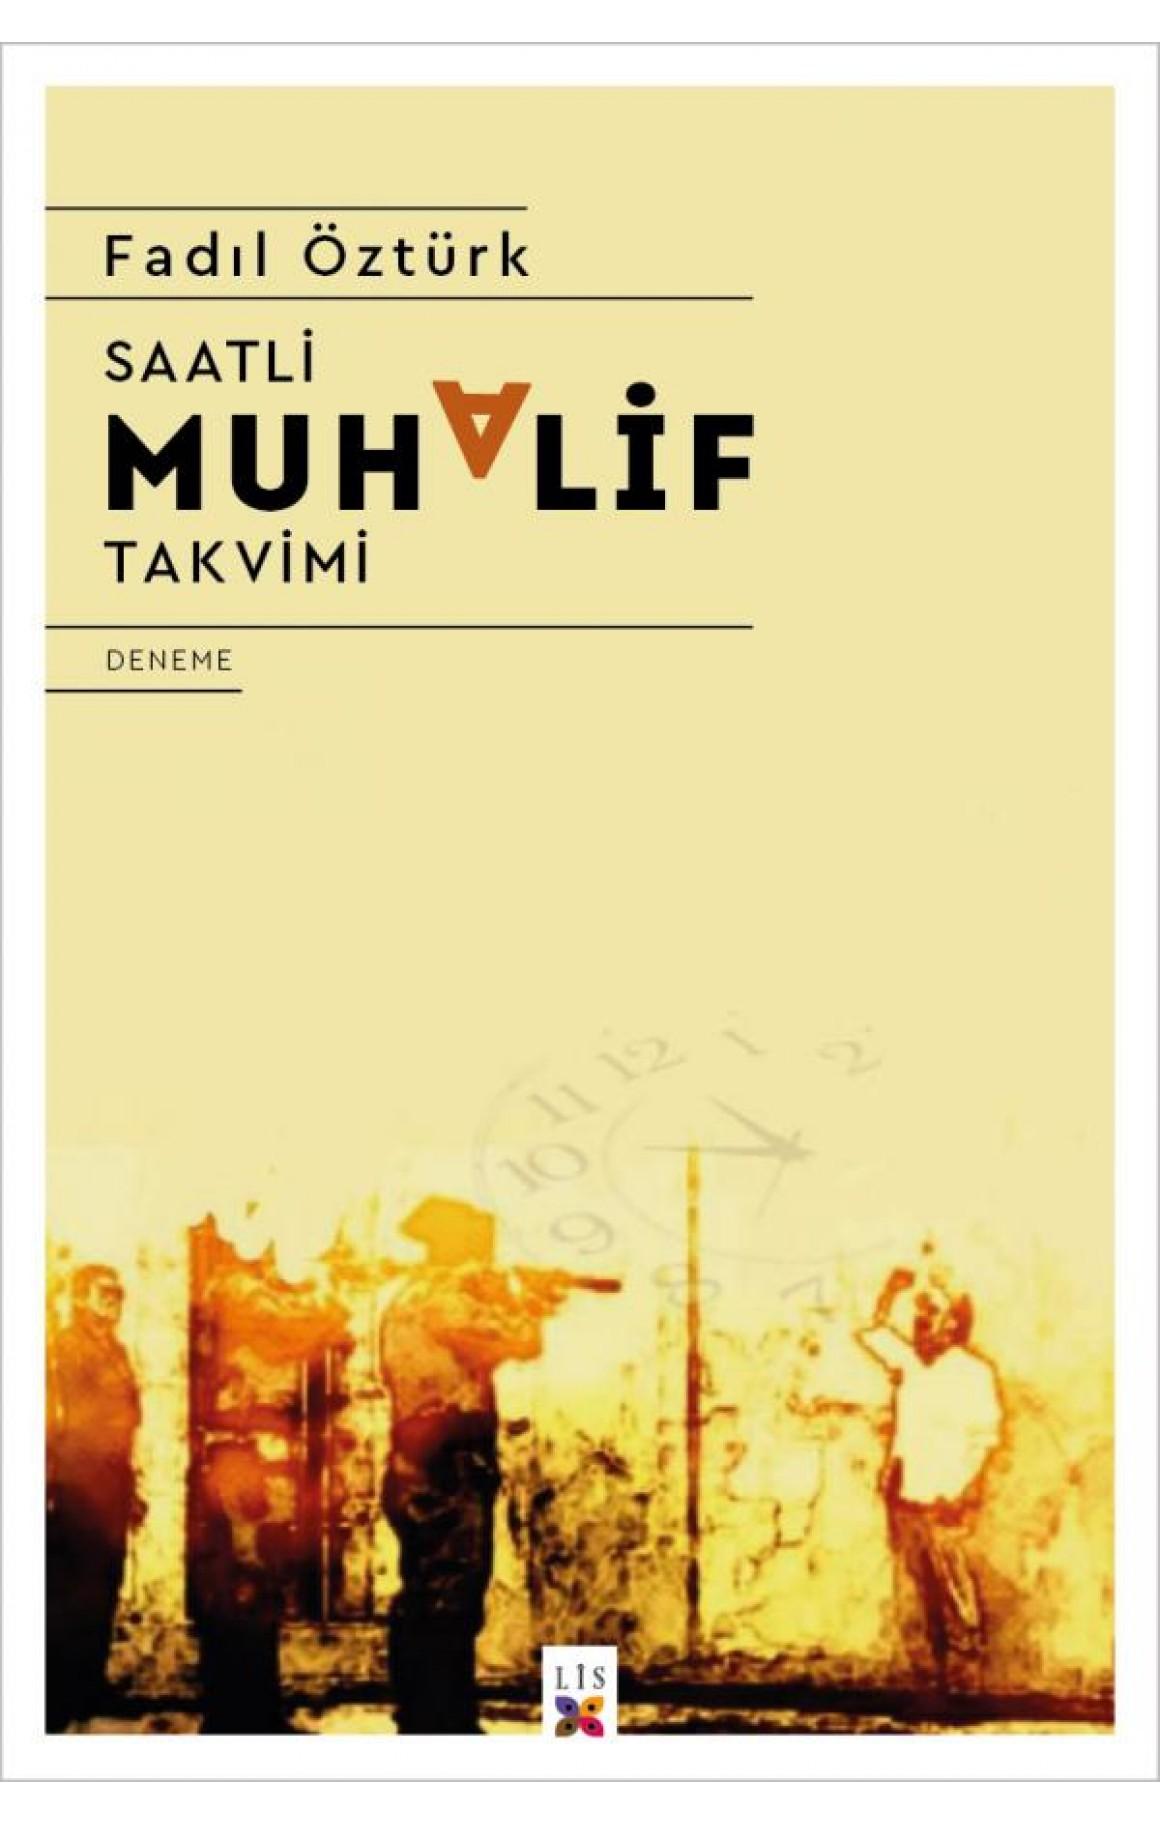 Saatli Muhalif Takvimi